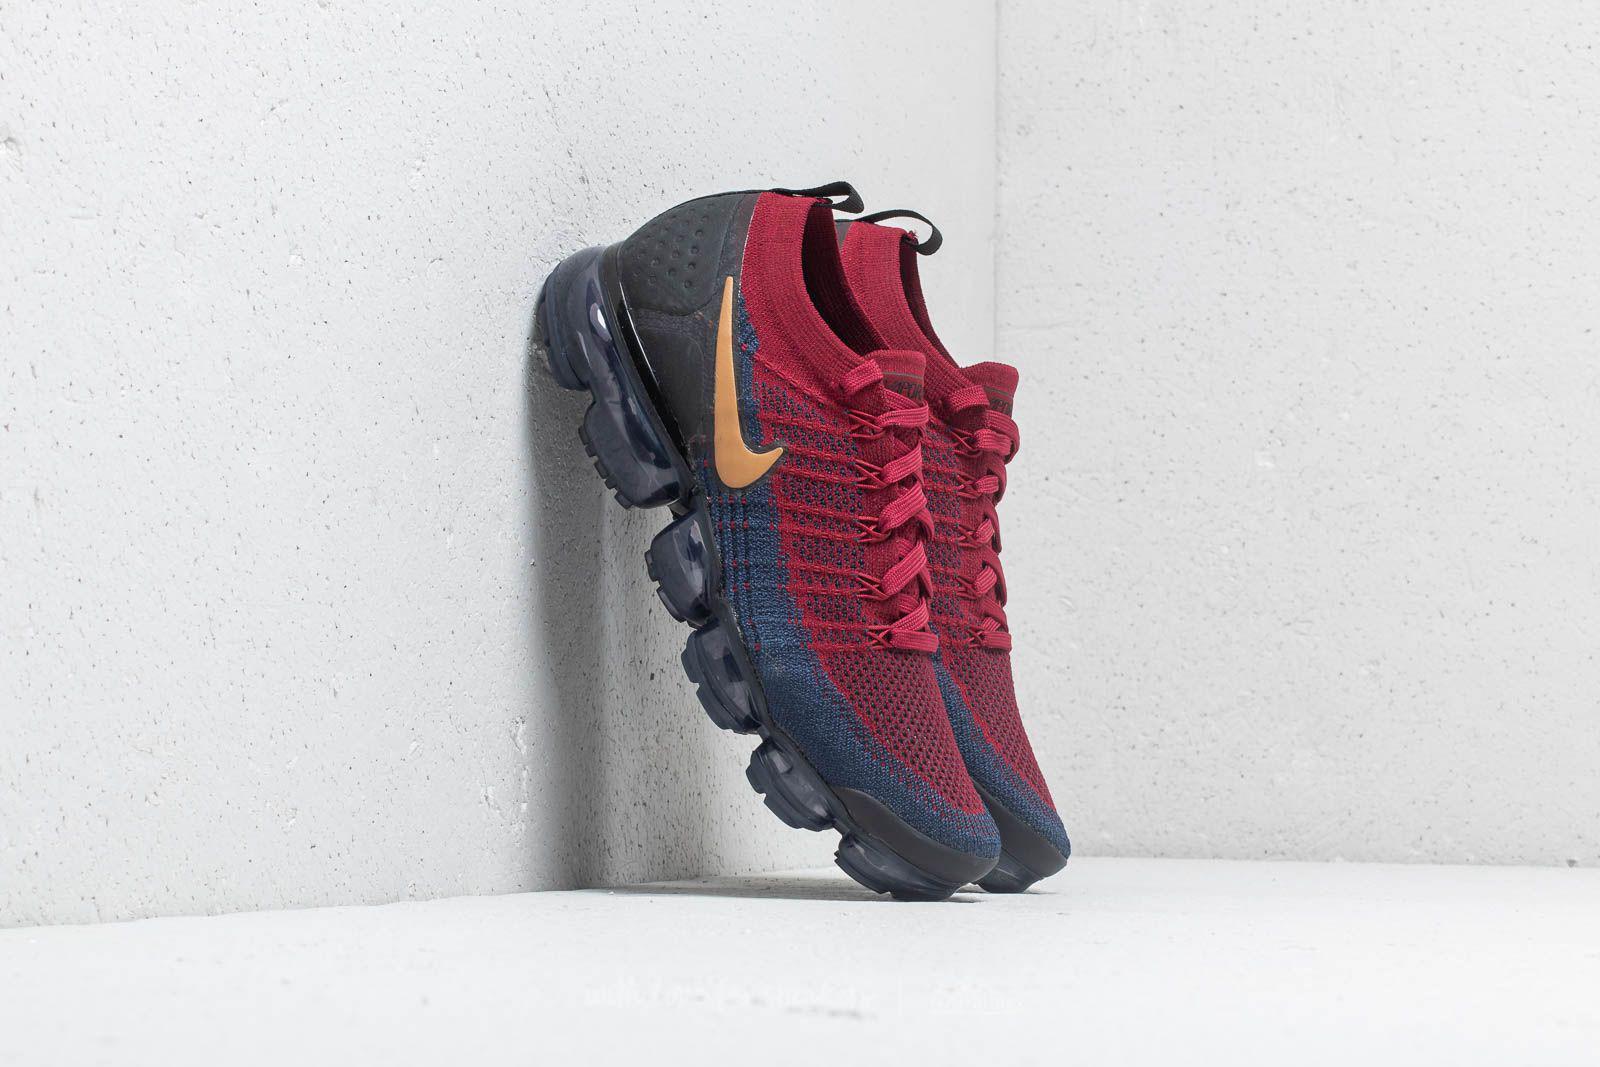 ad9b43847400 Lyst - Nike Air Vapormax Flyknit 2 Team Red  Wheat-obsidian-black ...